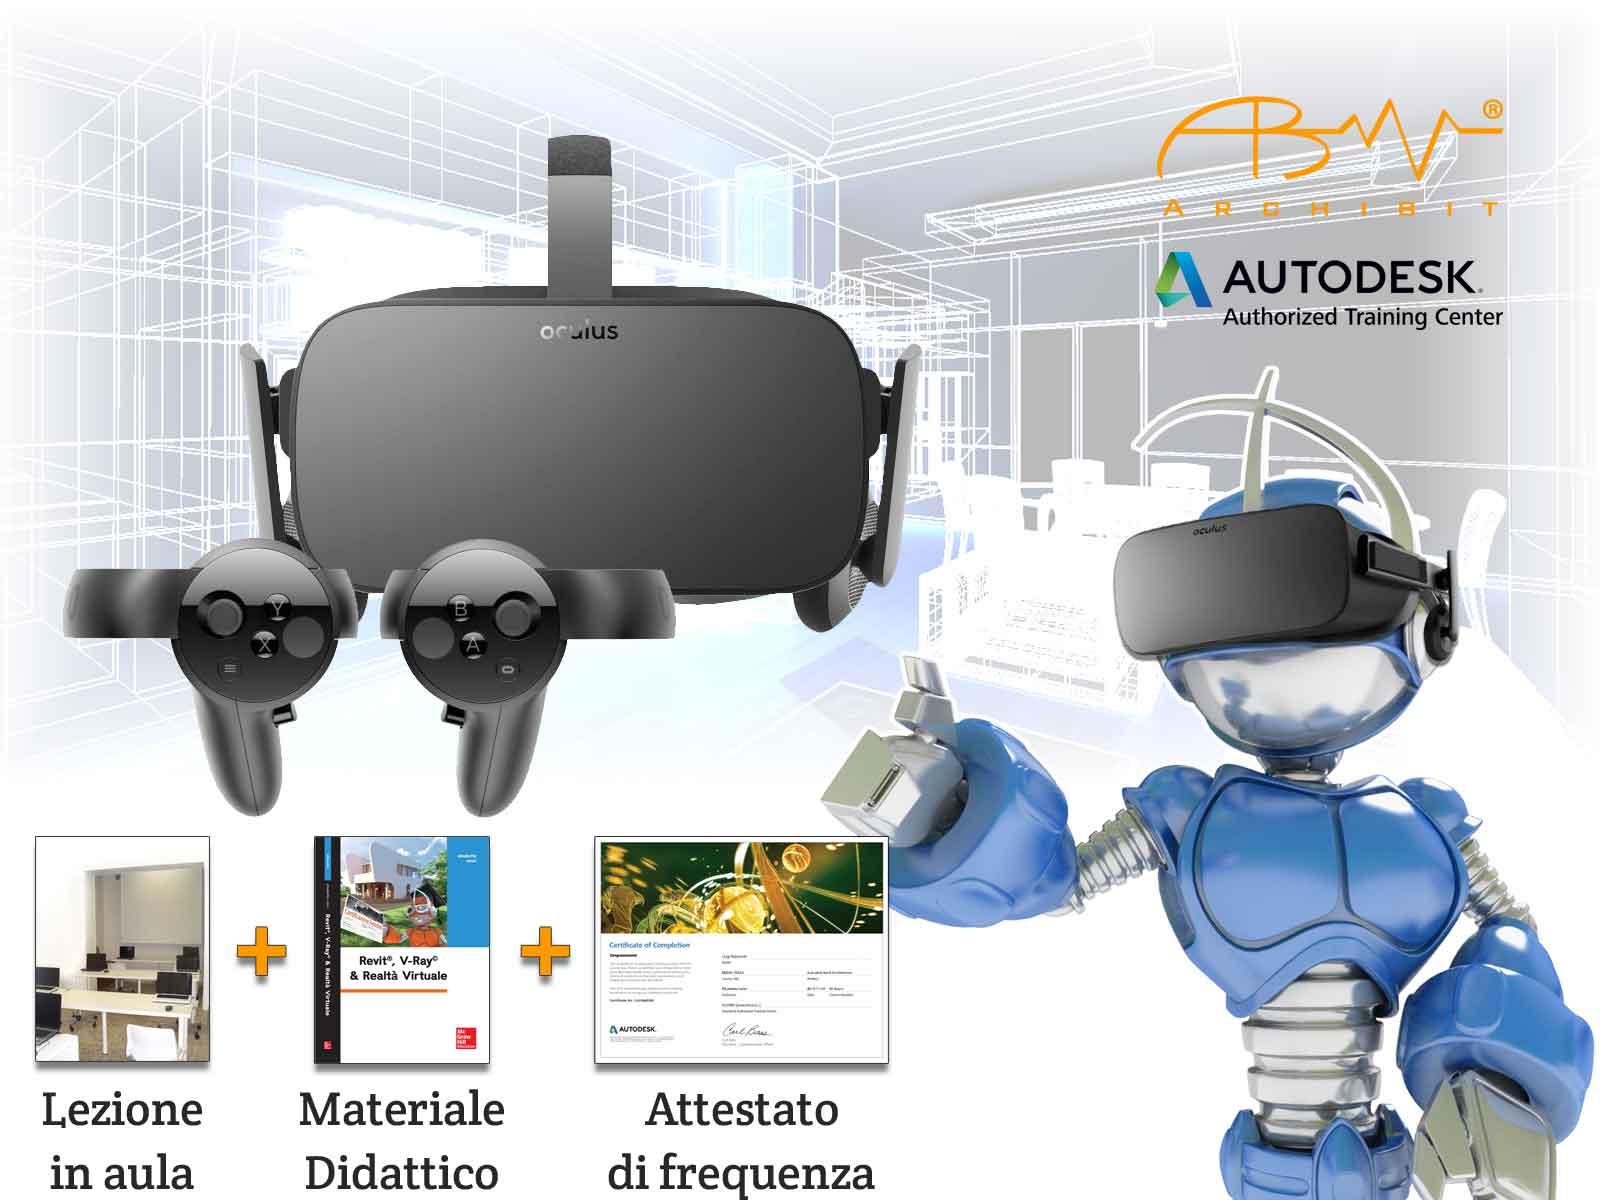 Corso Revit e realtà virtuale Autodesk